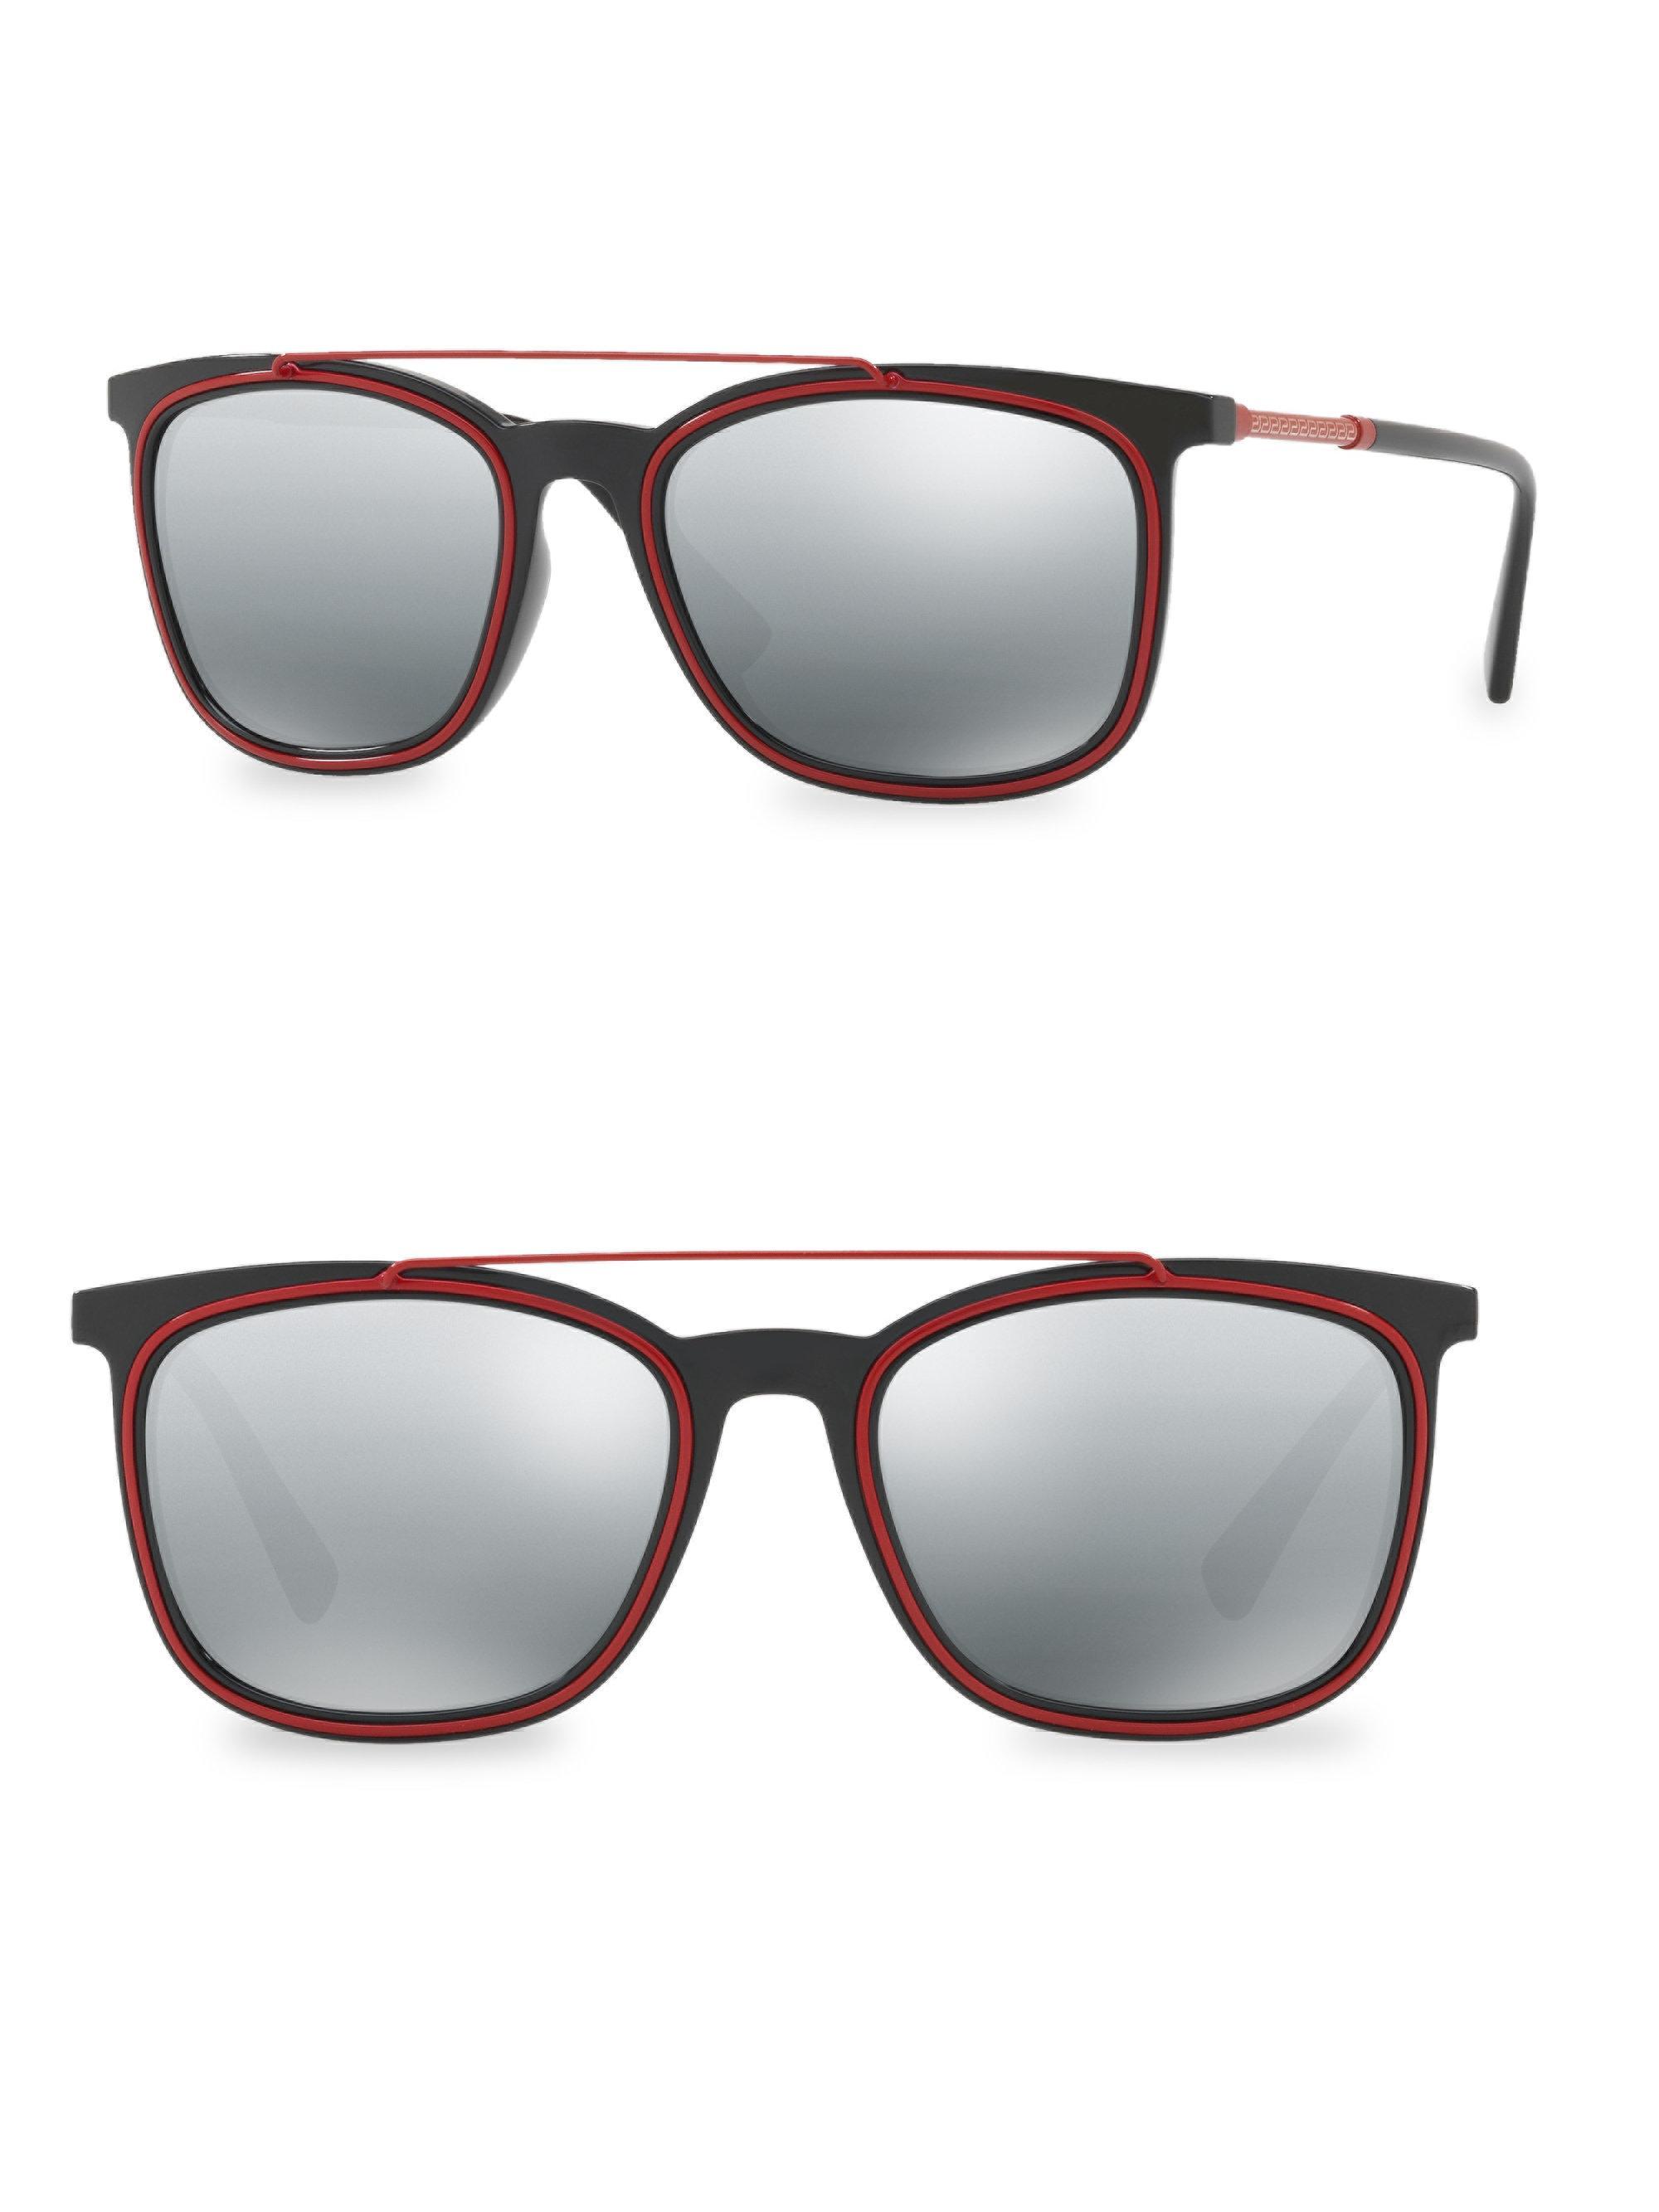 8293197346fc Versace 56mm Wayfarer Gradient Sunglasses in Gray for Men - Lyst